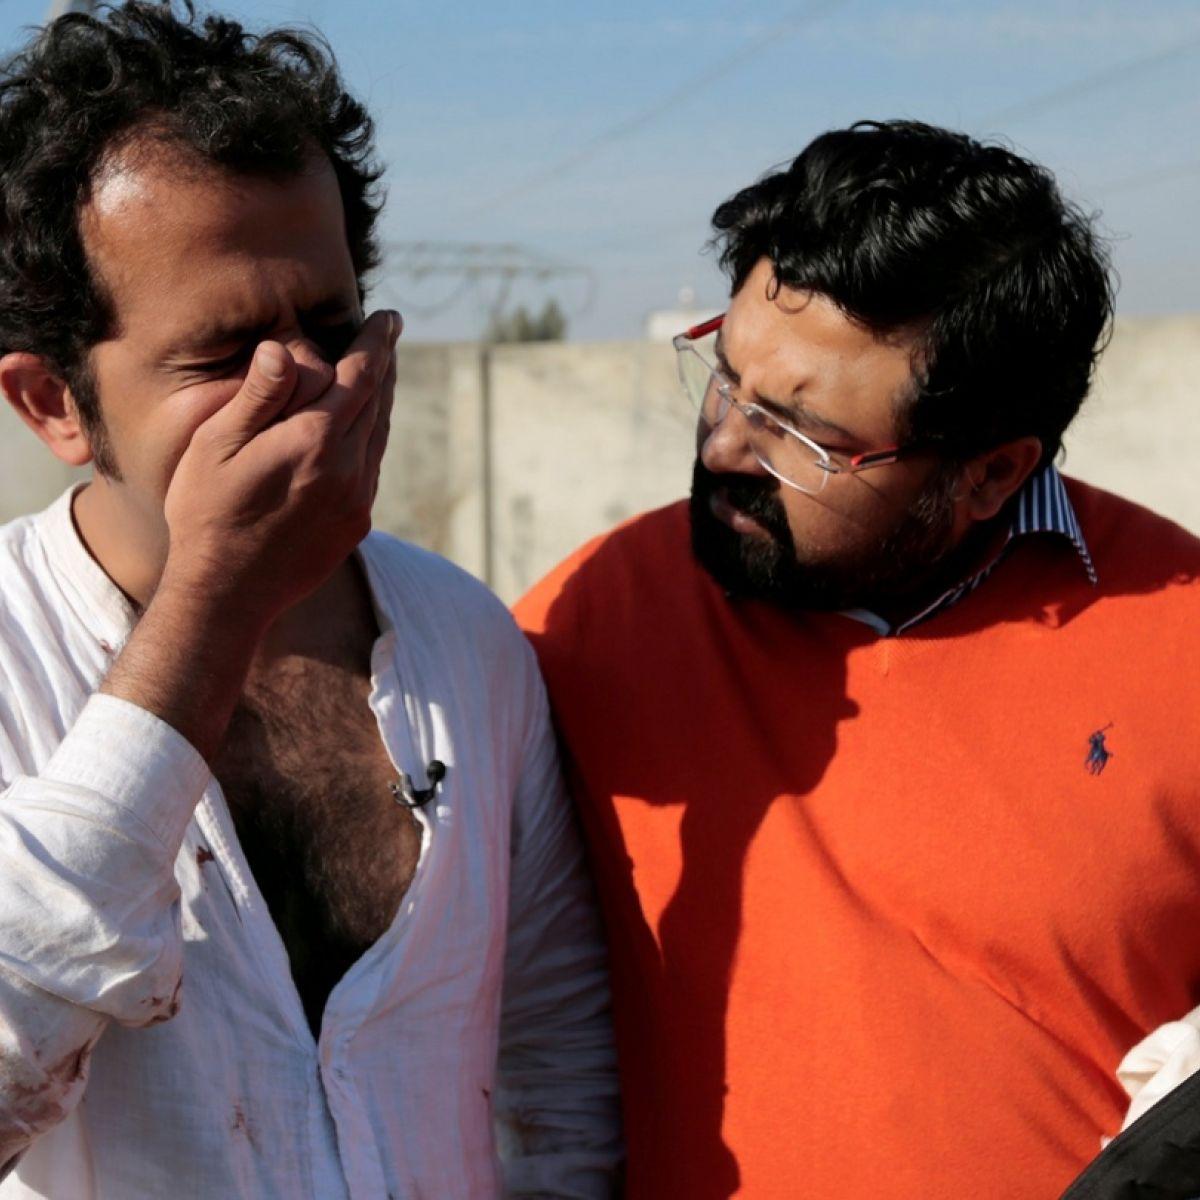 Pakistan's 'new normal': a journalist on the run from gunmen